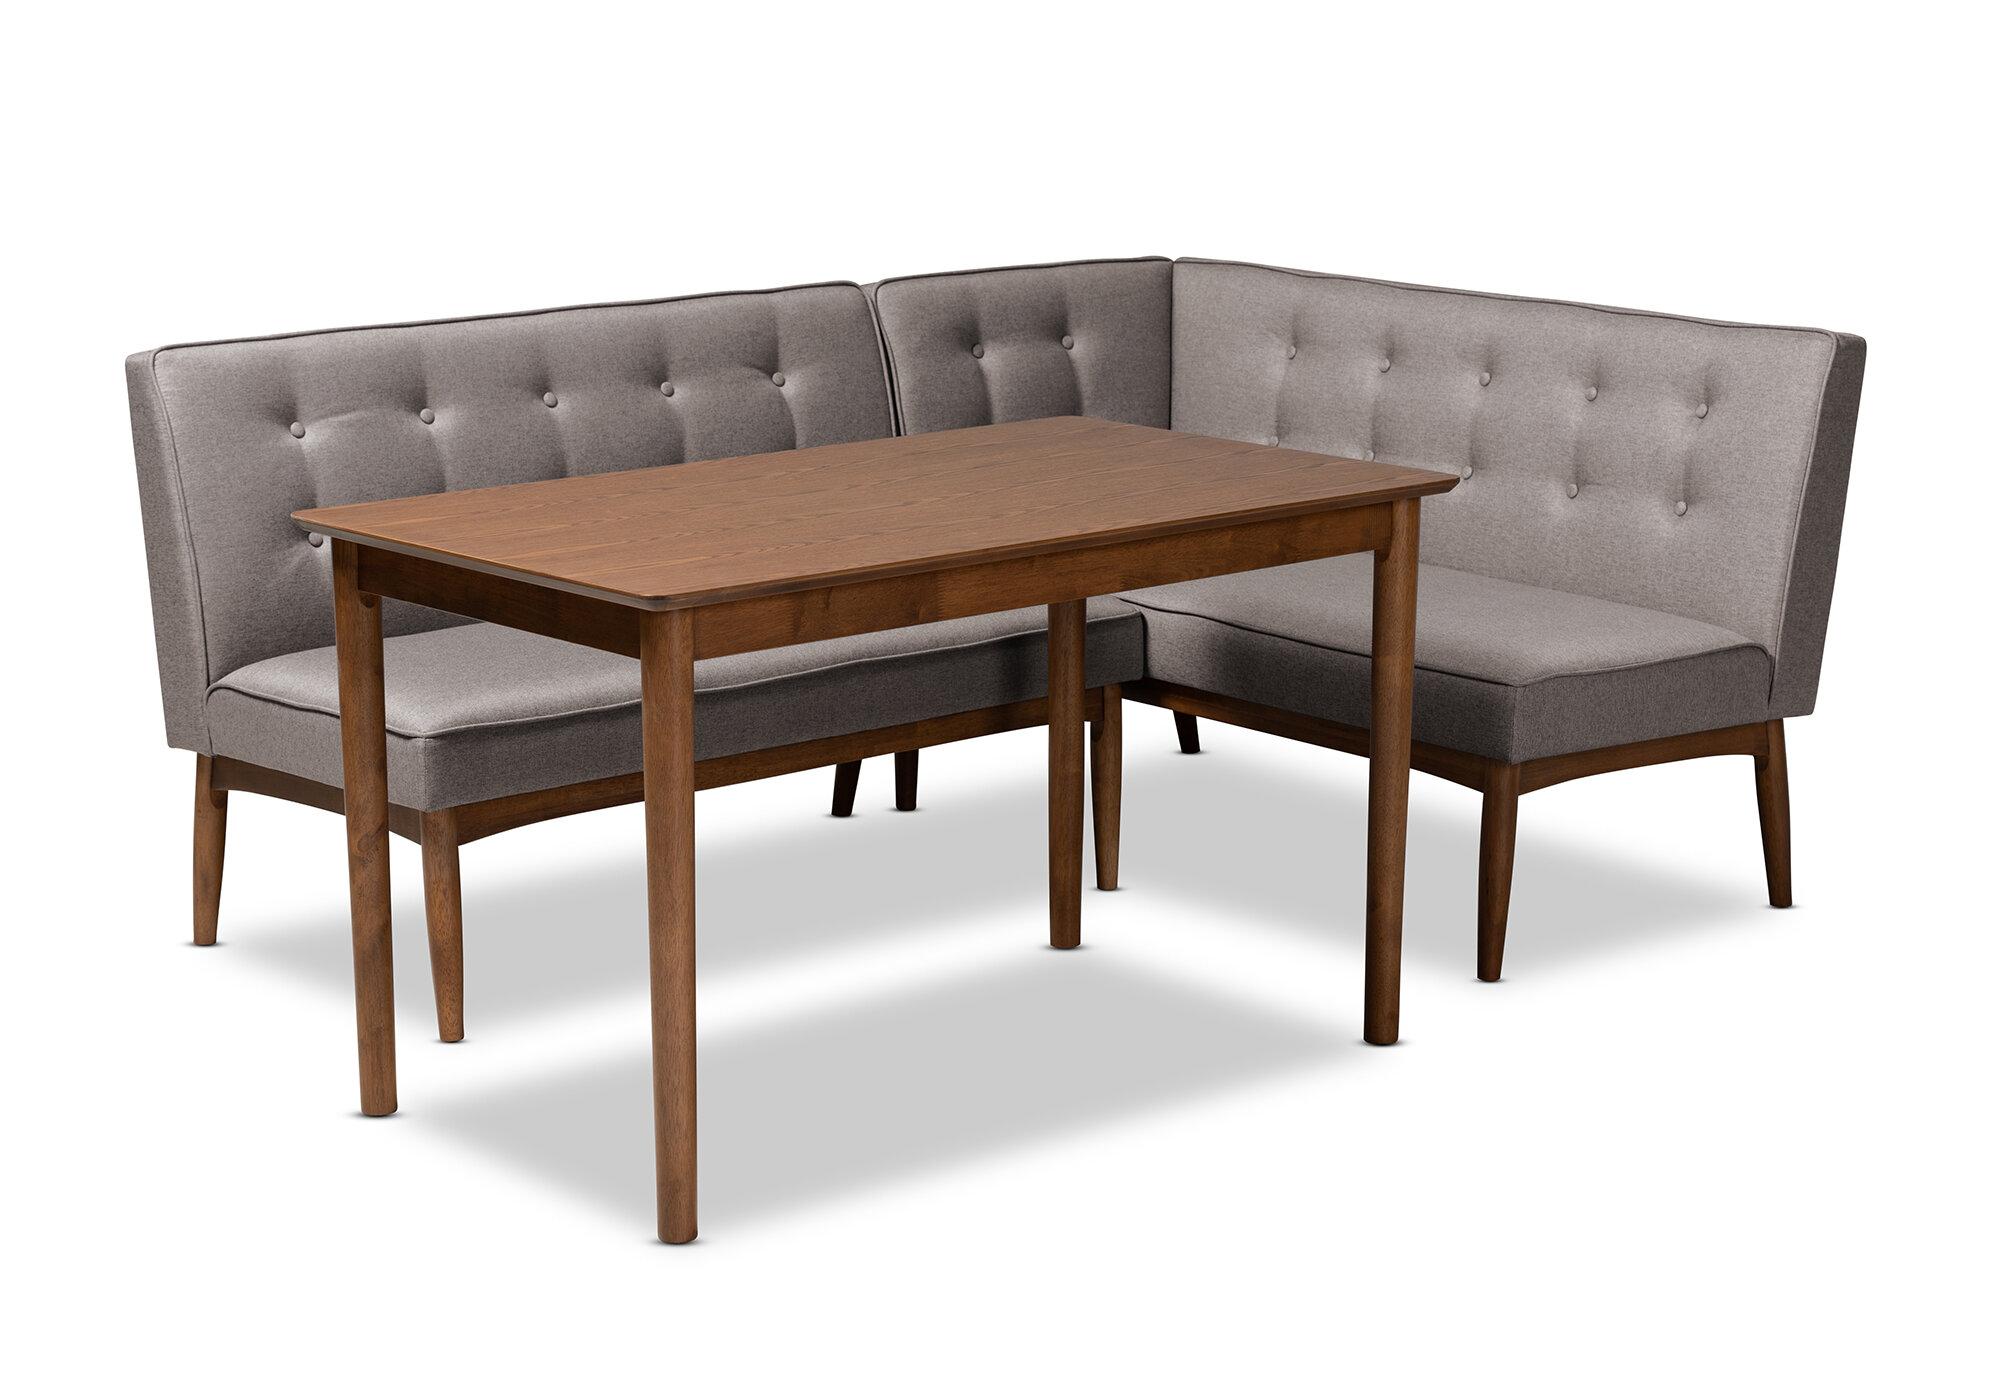 Superb Bopp Mid Century Modern Upholstered 3 Piece Breakfast Nook Dining Set Forskolin Free Trial Chair Design Images Forskolin Free Trialorg